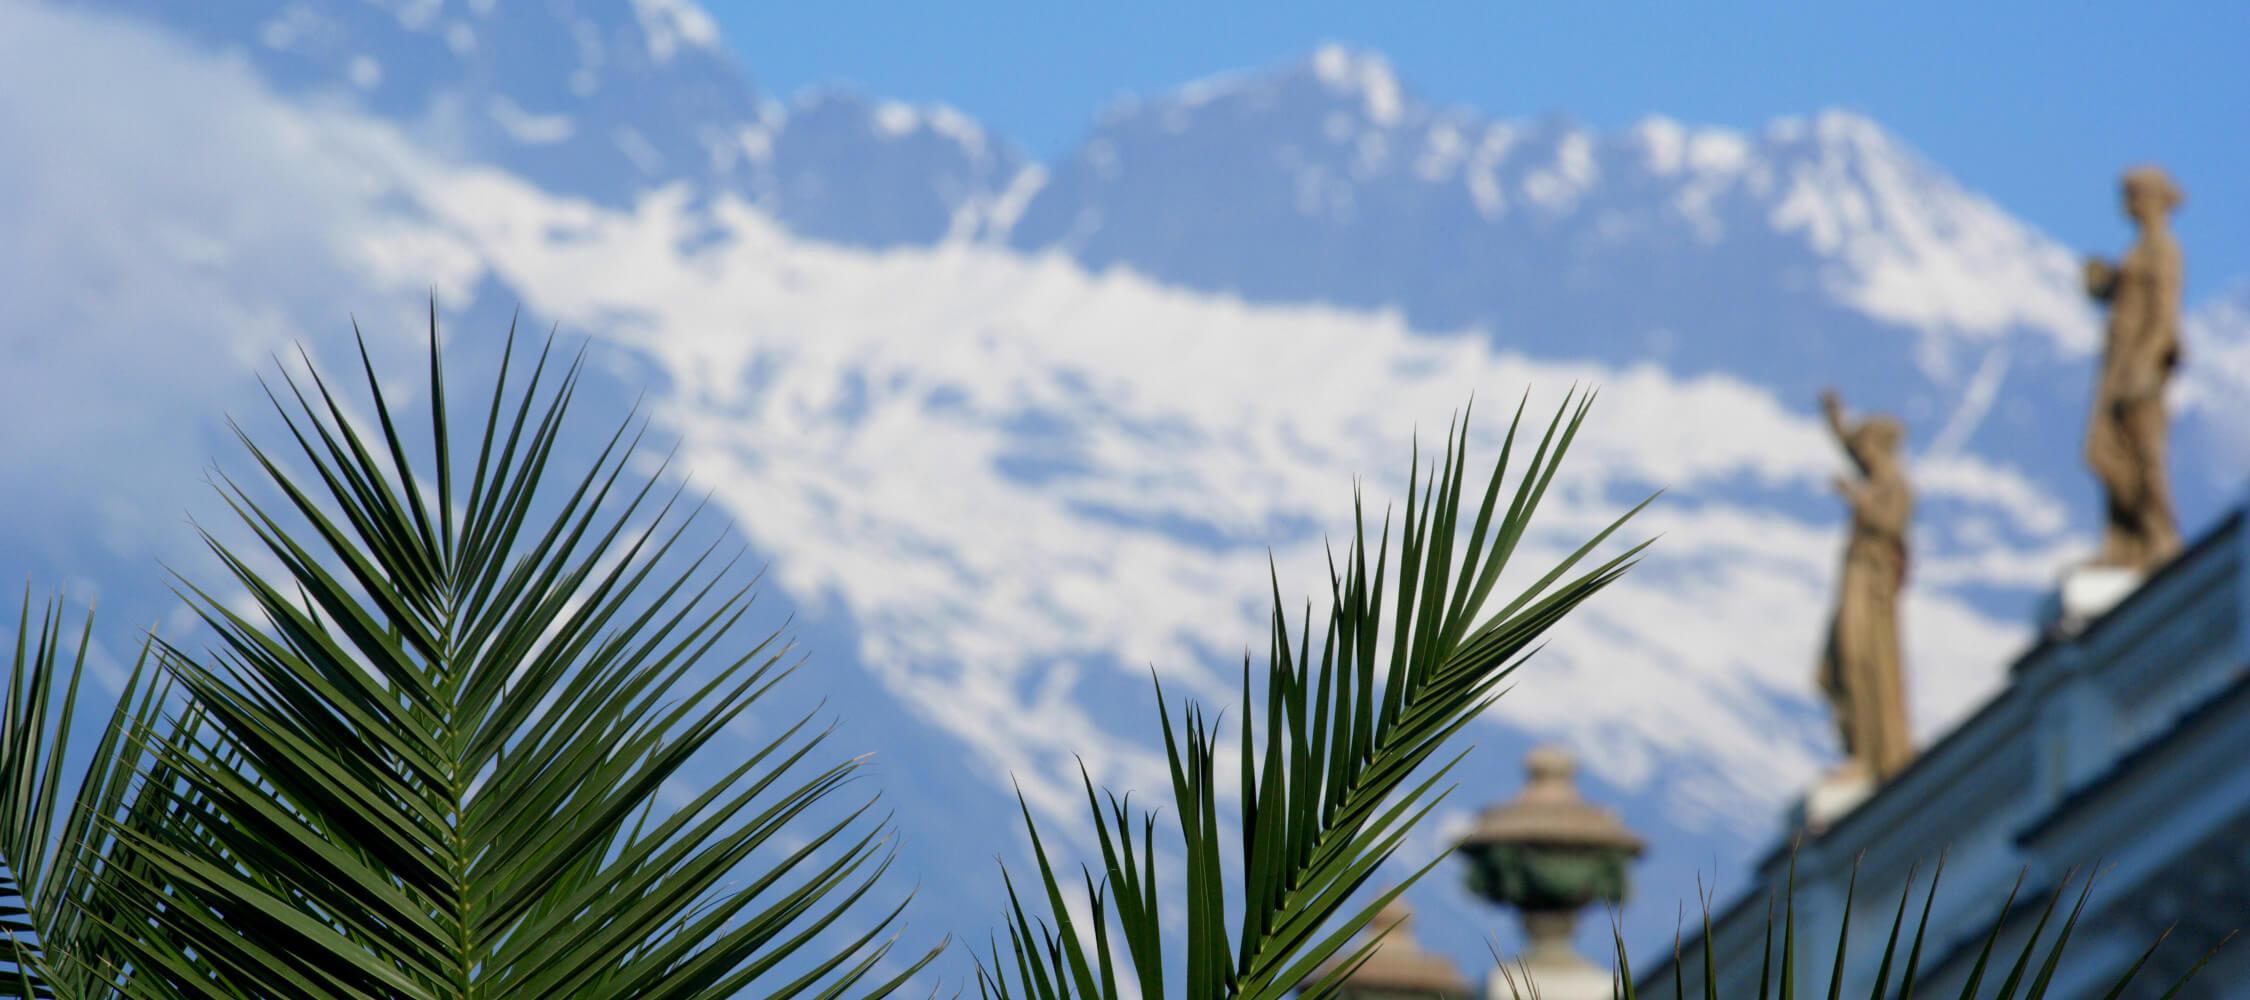 Italien-Trentino_Suedtirol_Alto_Adige_Merano_Meran_Natur_Fruehling_Palmen_Schnee_Kurhaus_MGM-Frieder-Blickle_mgm00366frbl_2250x1000